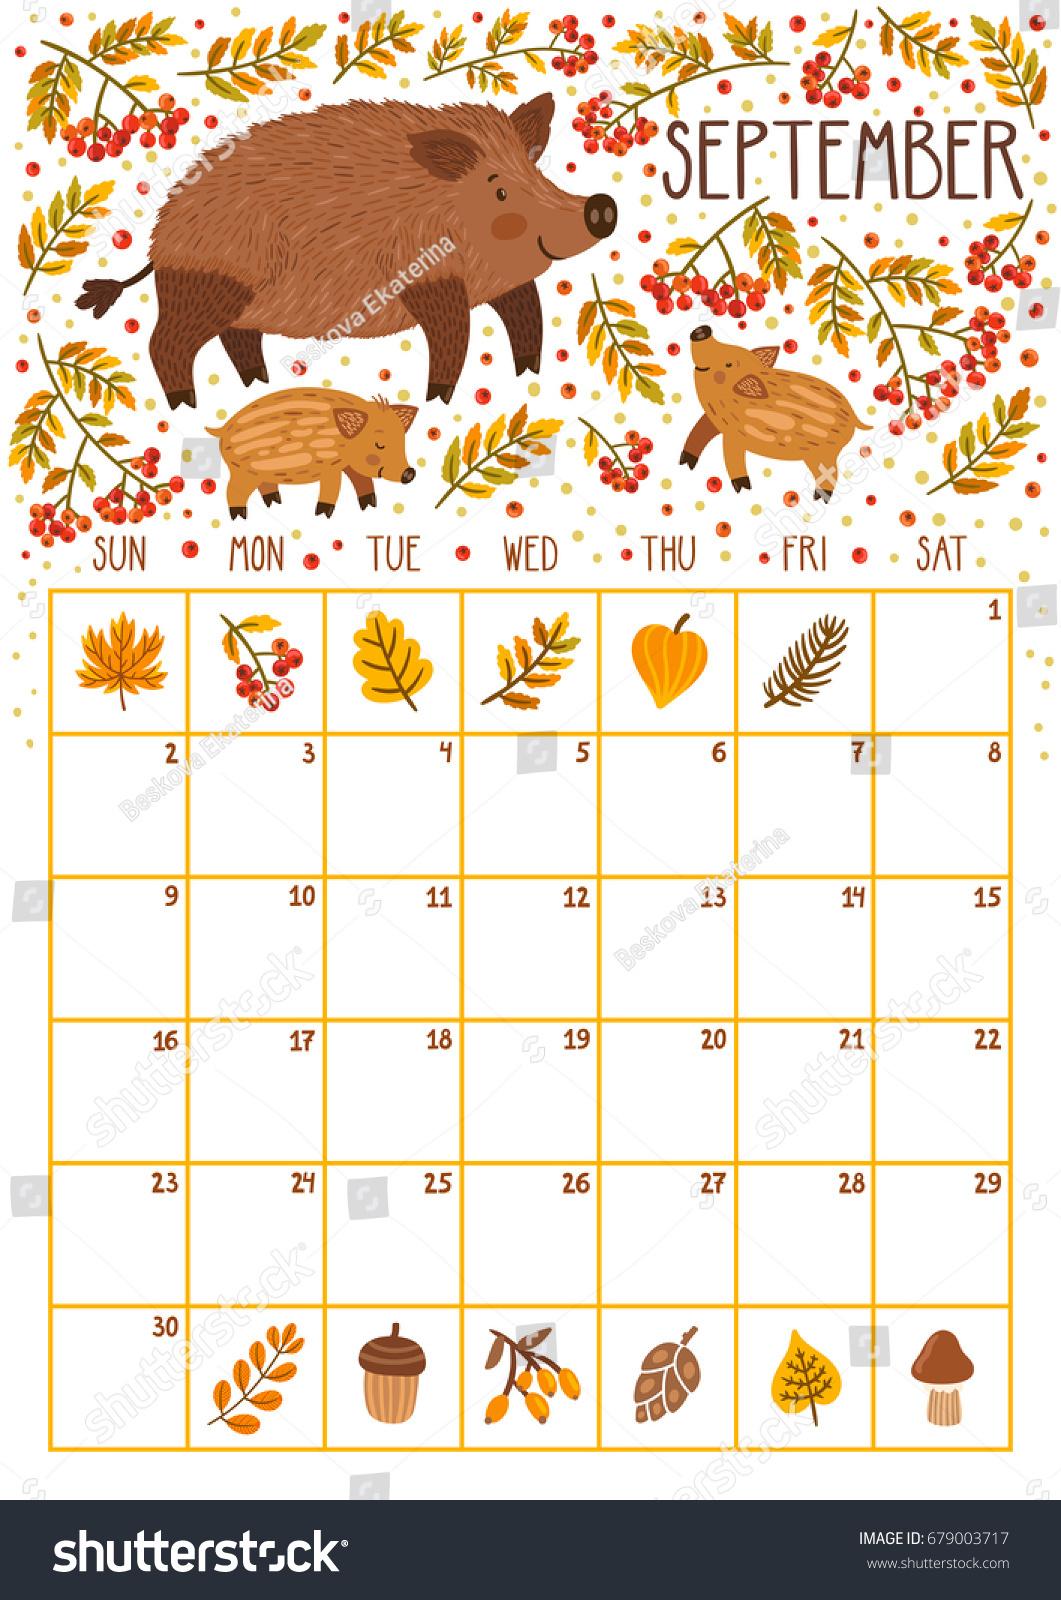 Weekly Calendar Cartoon : Vector monthly calendar cute wild boars stock